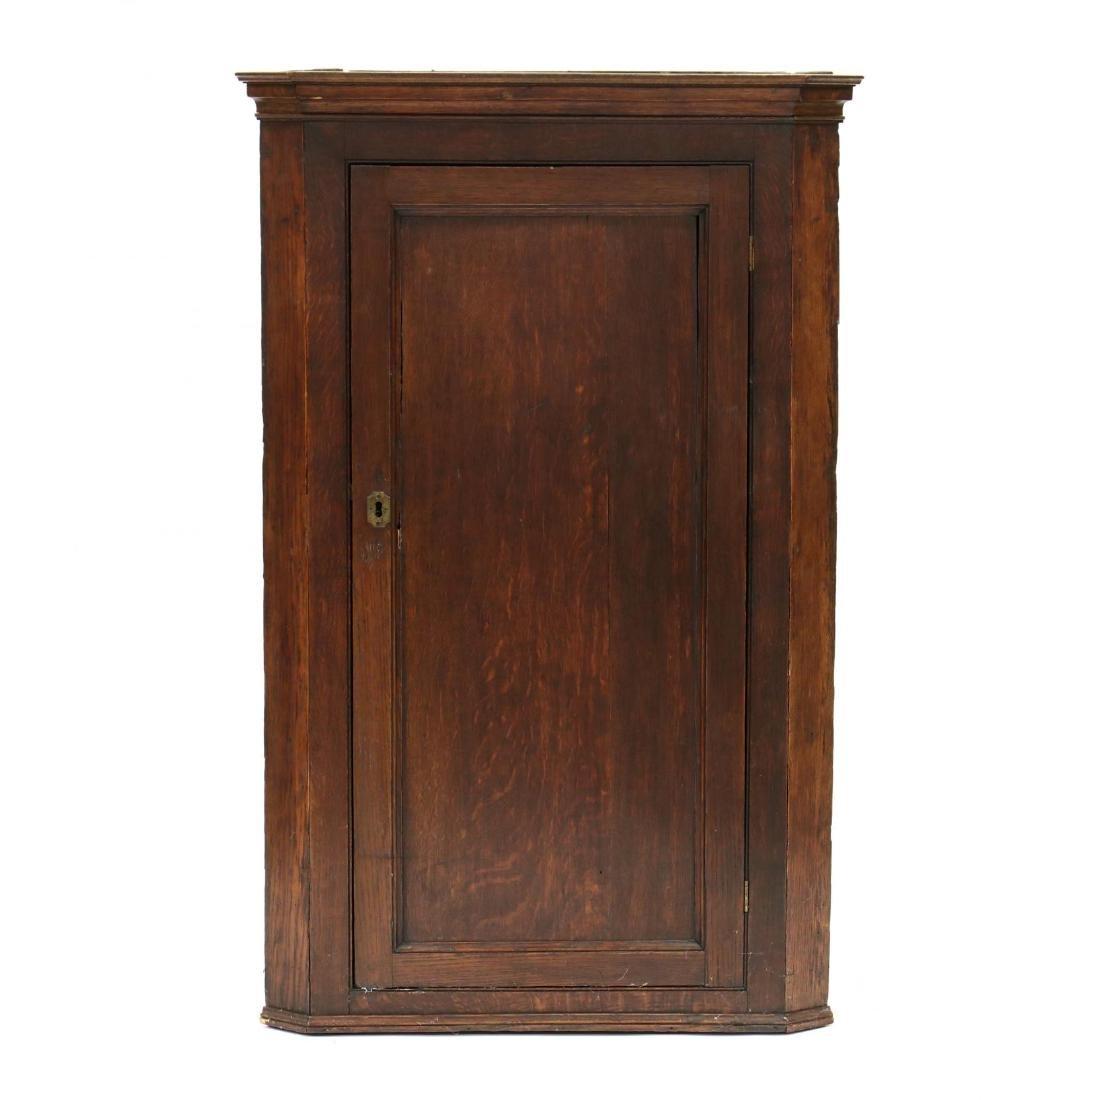 Edwardian Oak Hanging Corner Cabinet